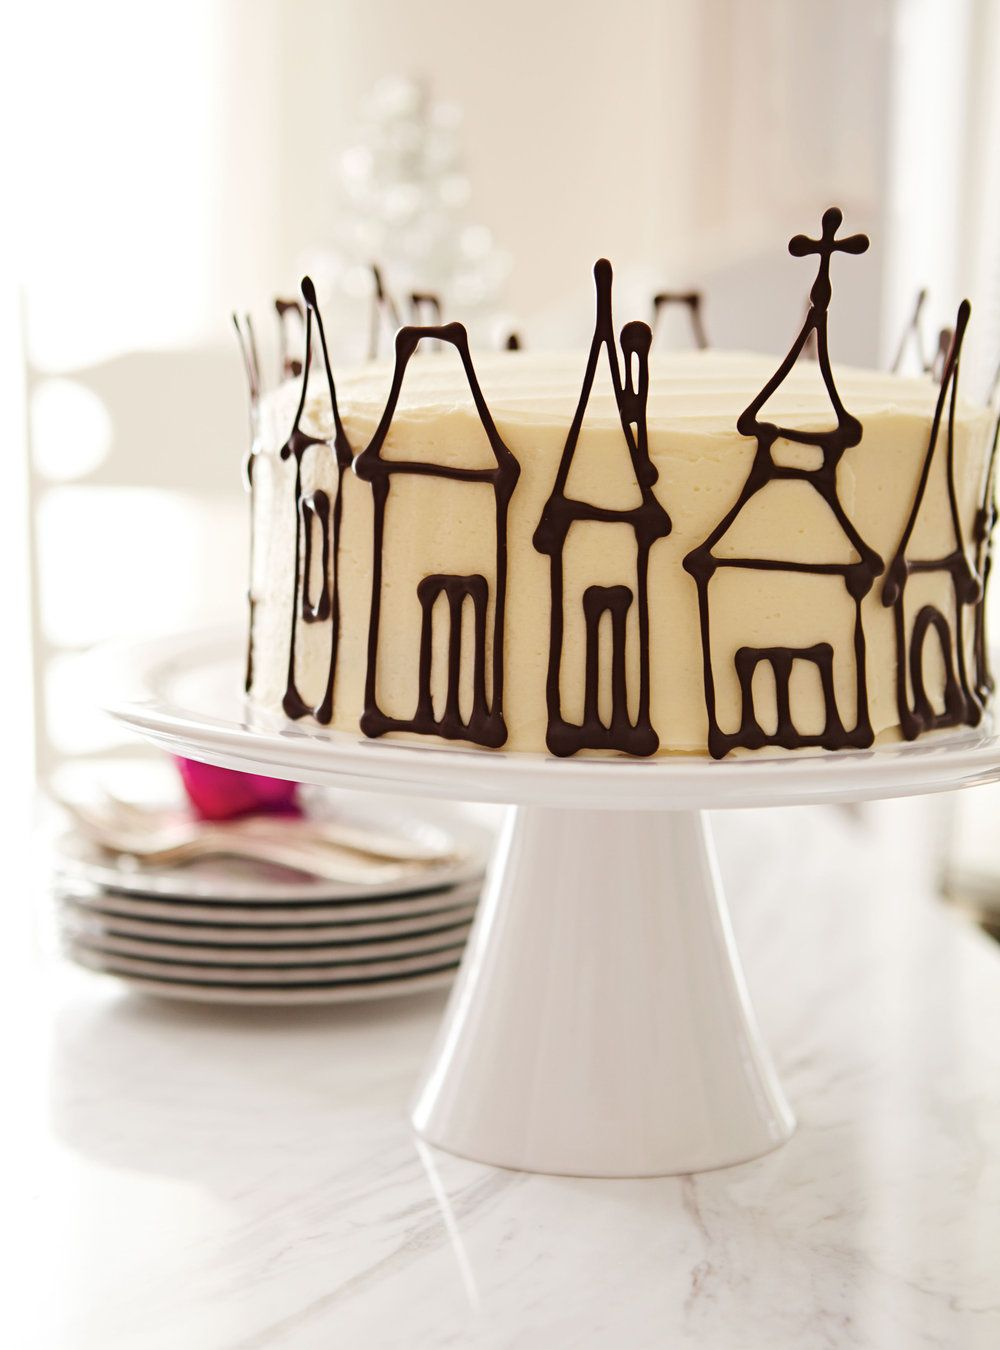 Ricardo's recipe: Little Chocolate Houses